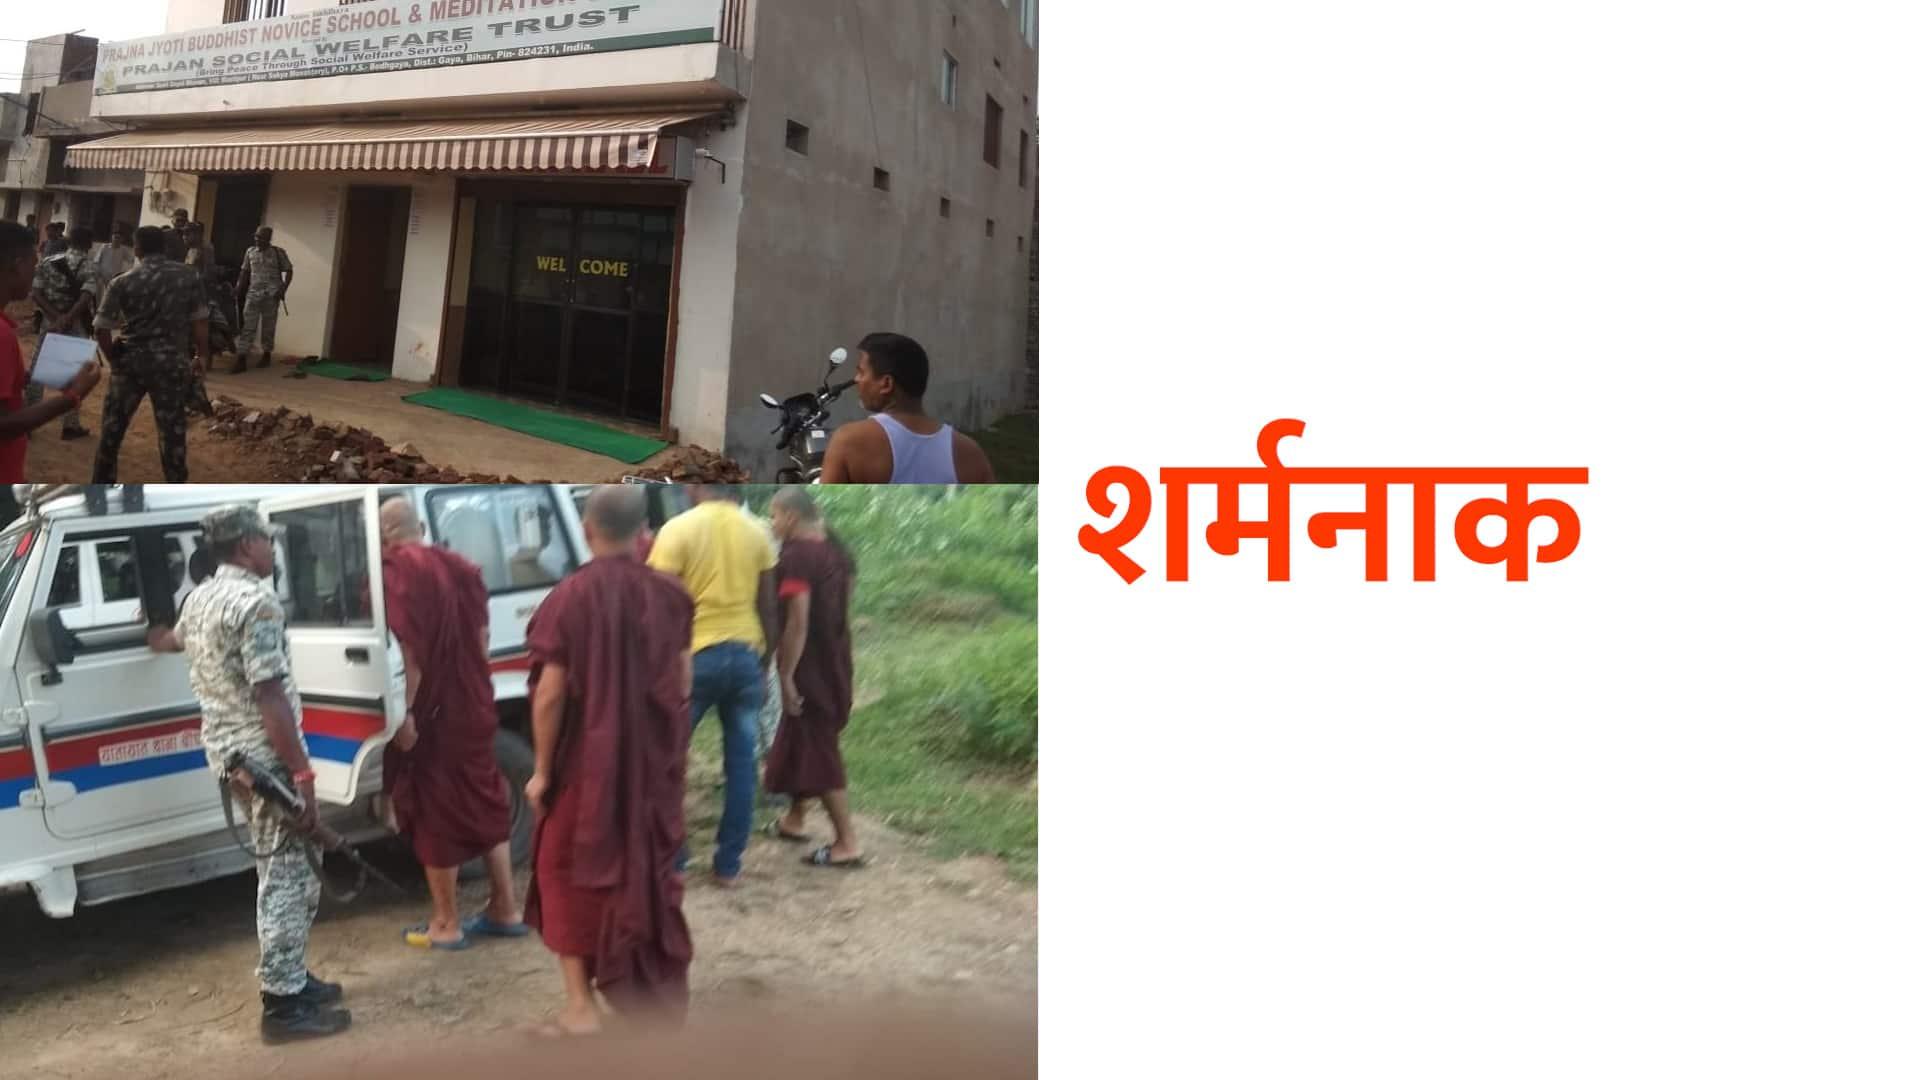 sexually abuse Buddhist monk Bodh Gaya minor children school bihar